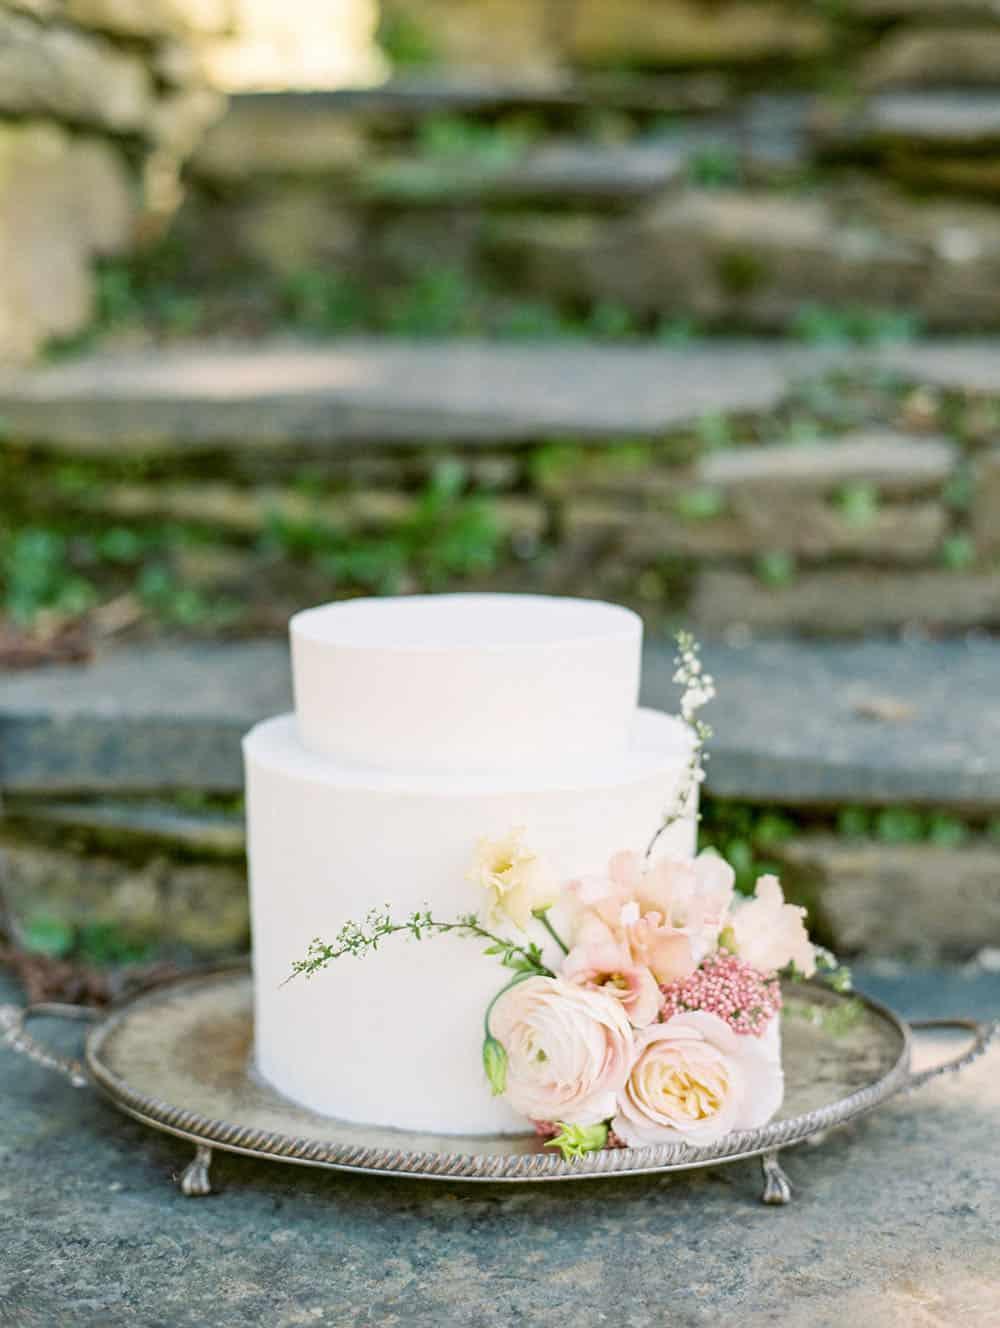 spring buttercream cake with seasonally inspired wedding flowers